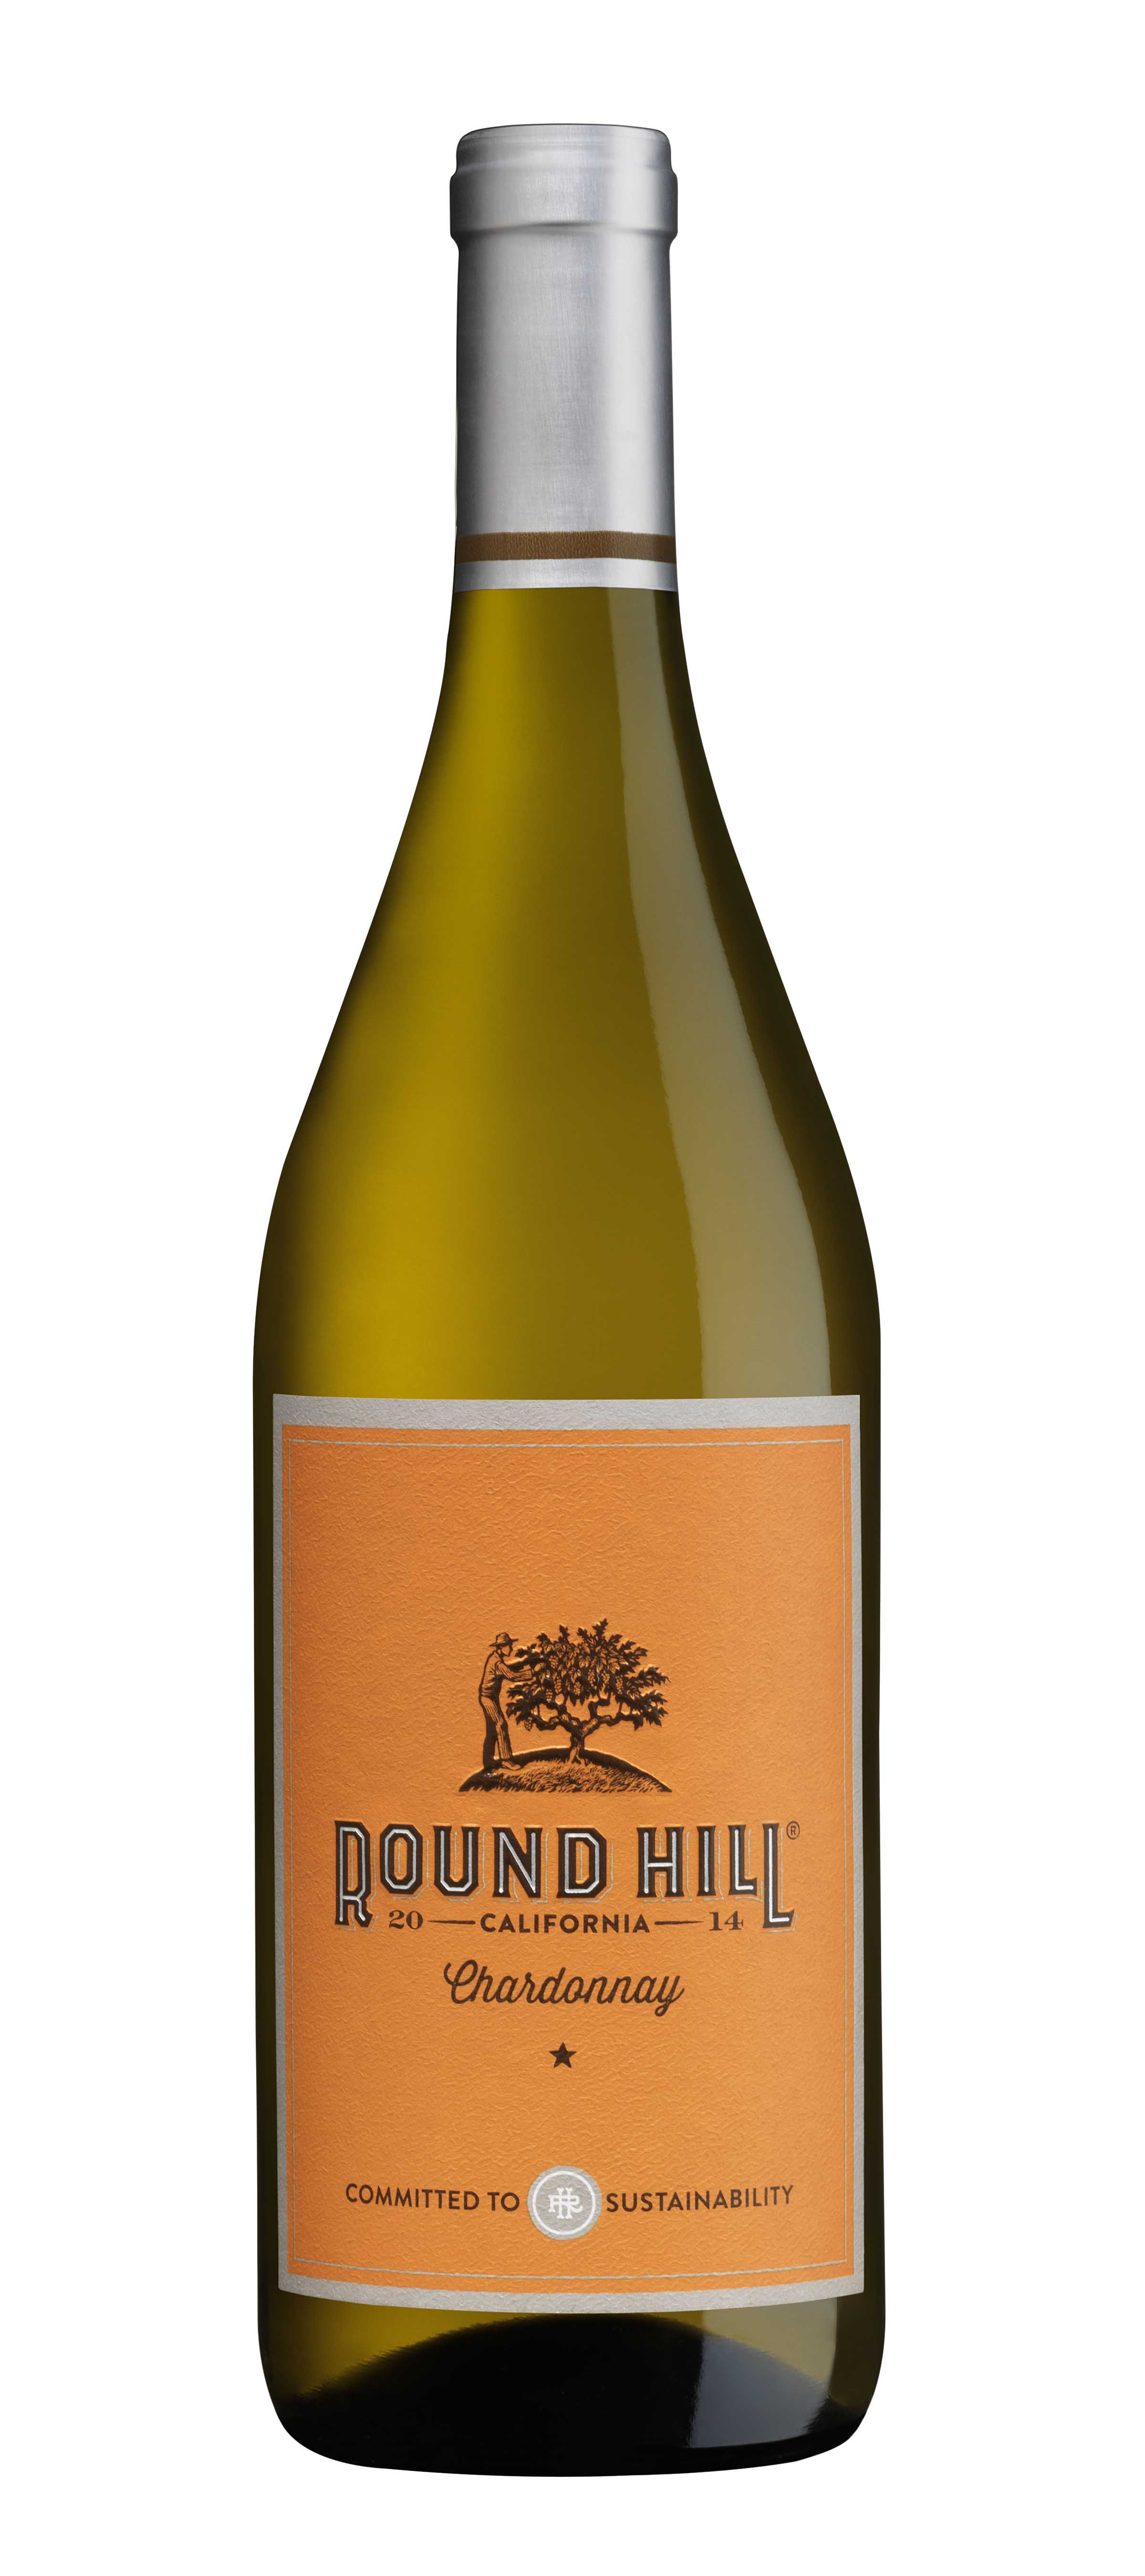 Roundhill Chardonnay